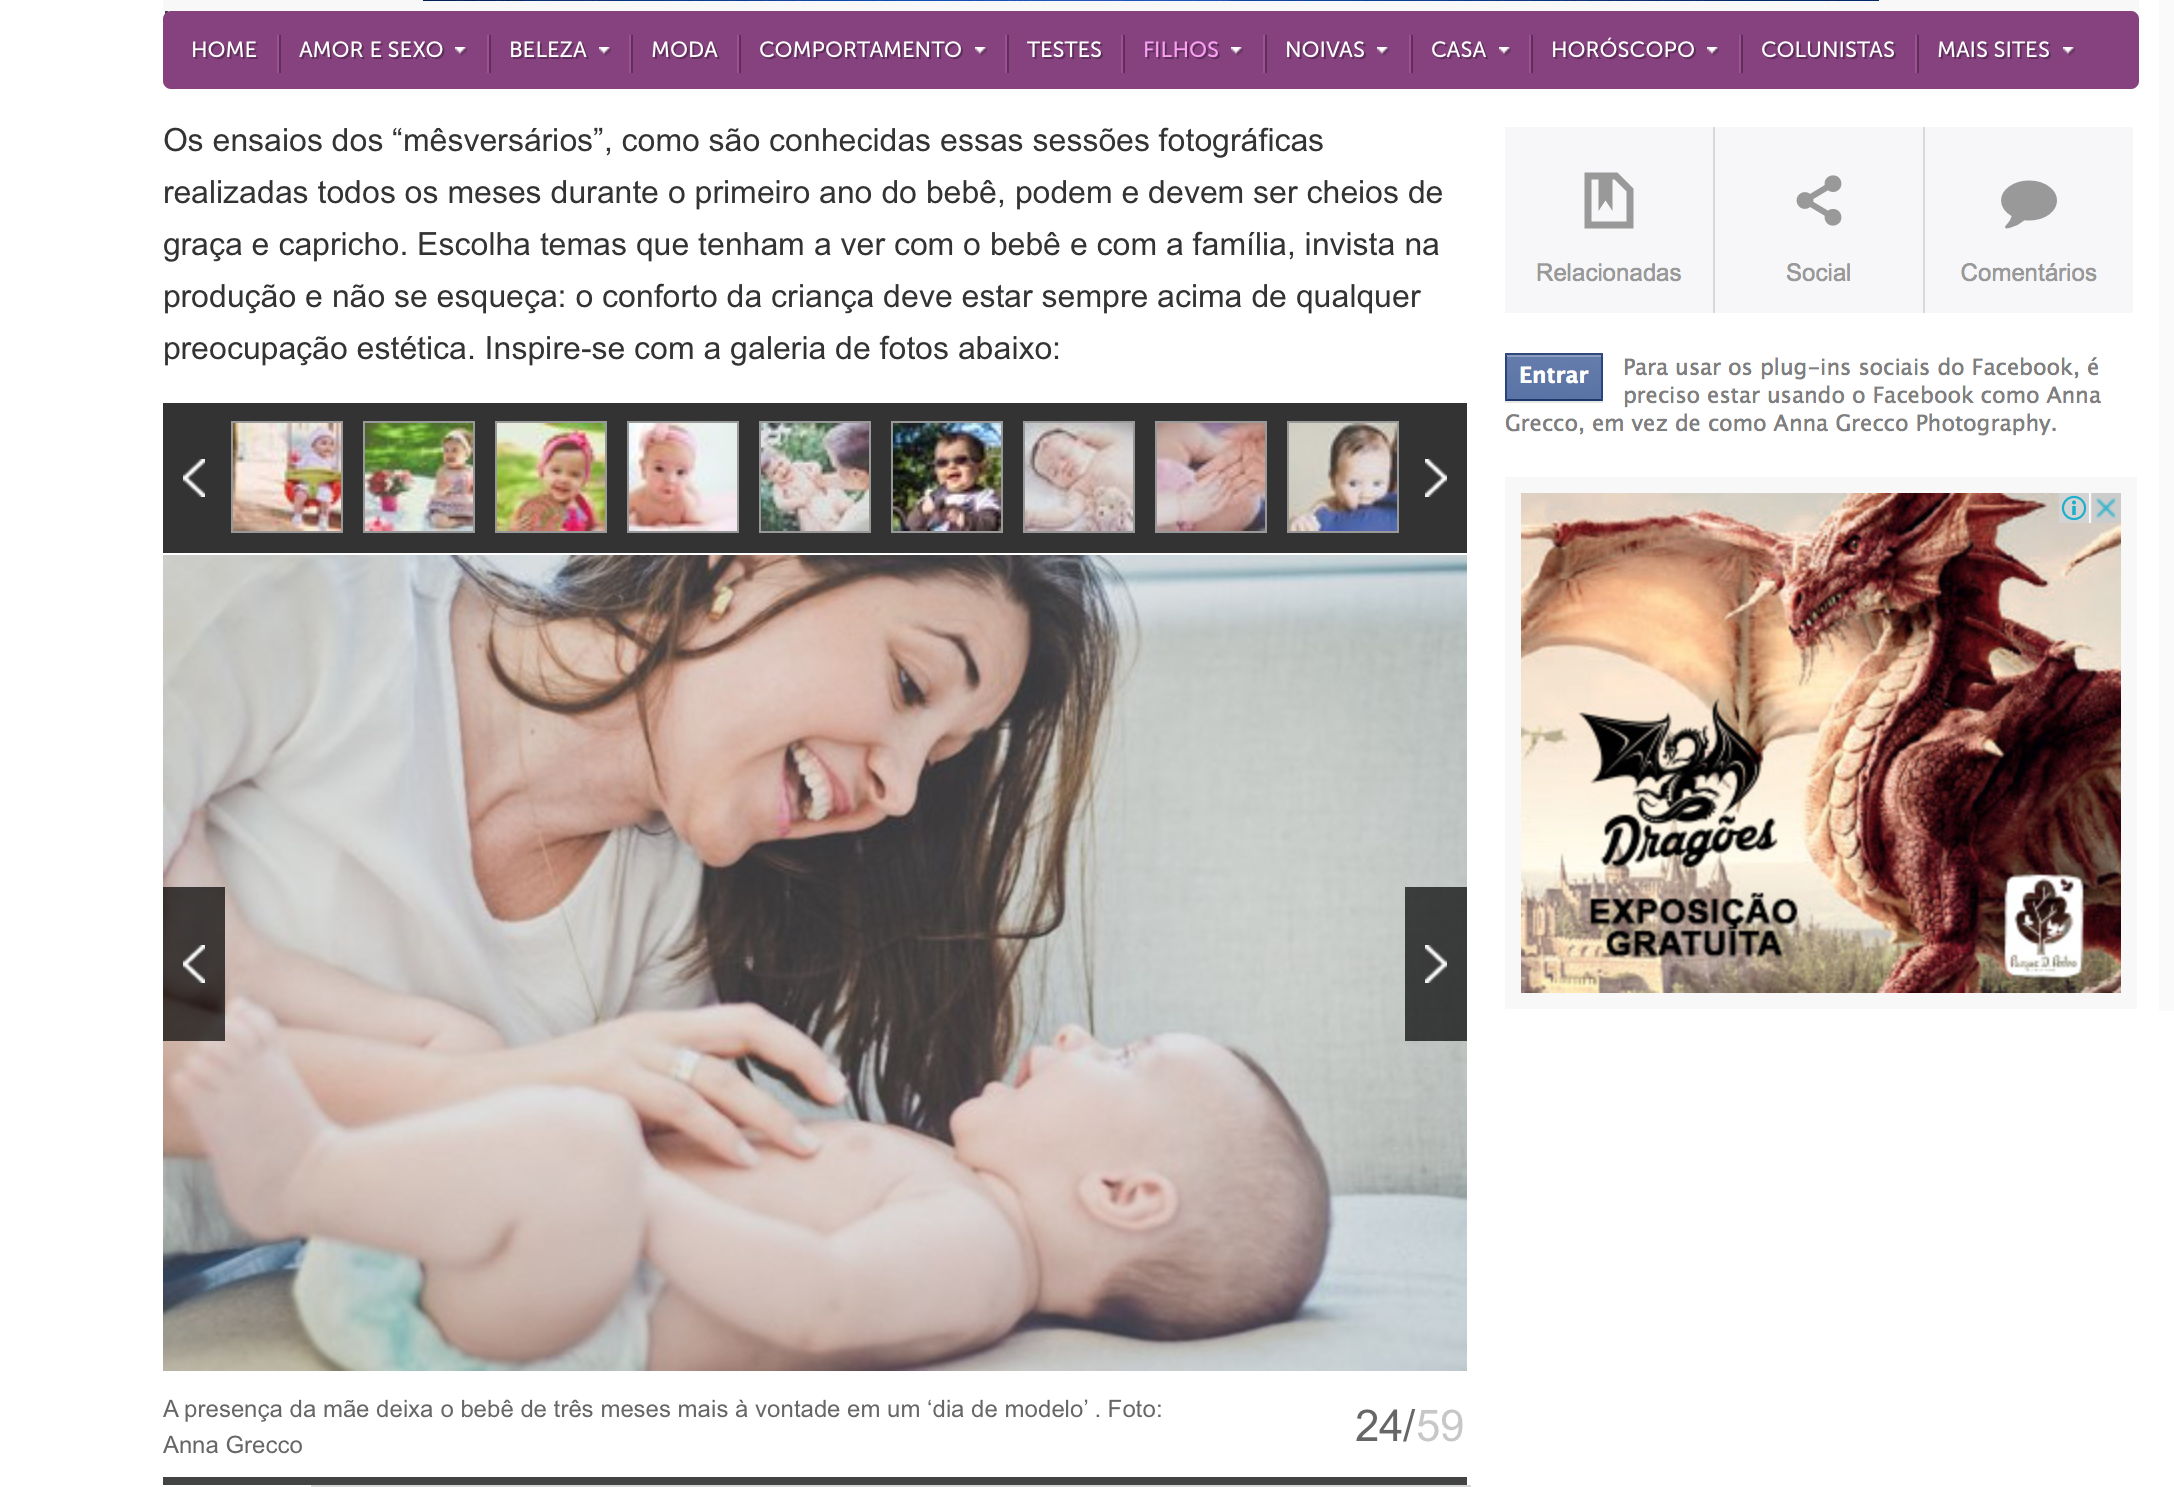 mesversarios anna greco aniversario acompanhamento crescimento do bebe www.annagrecco.com.br bebes baby